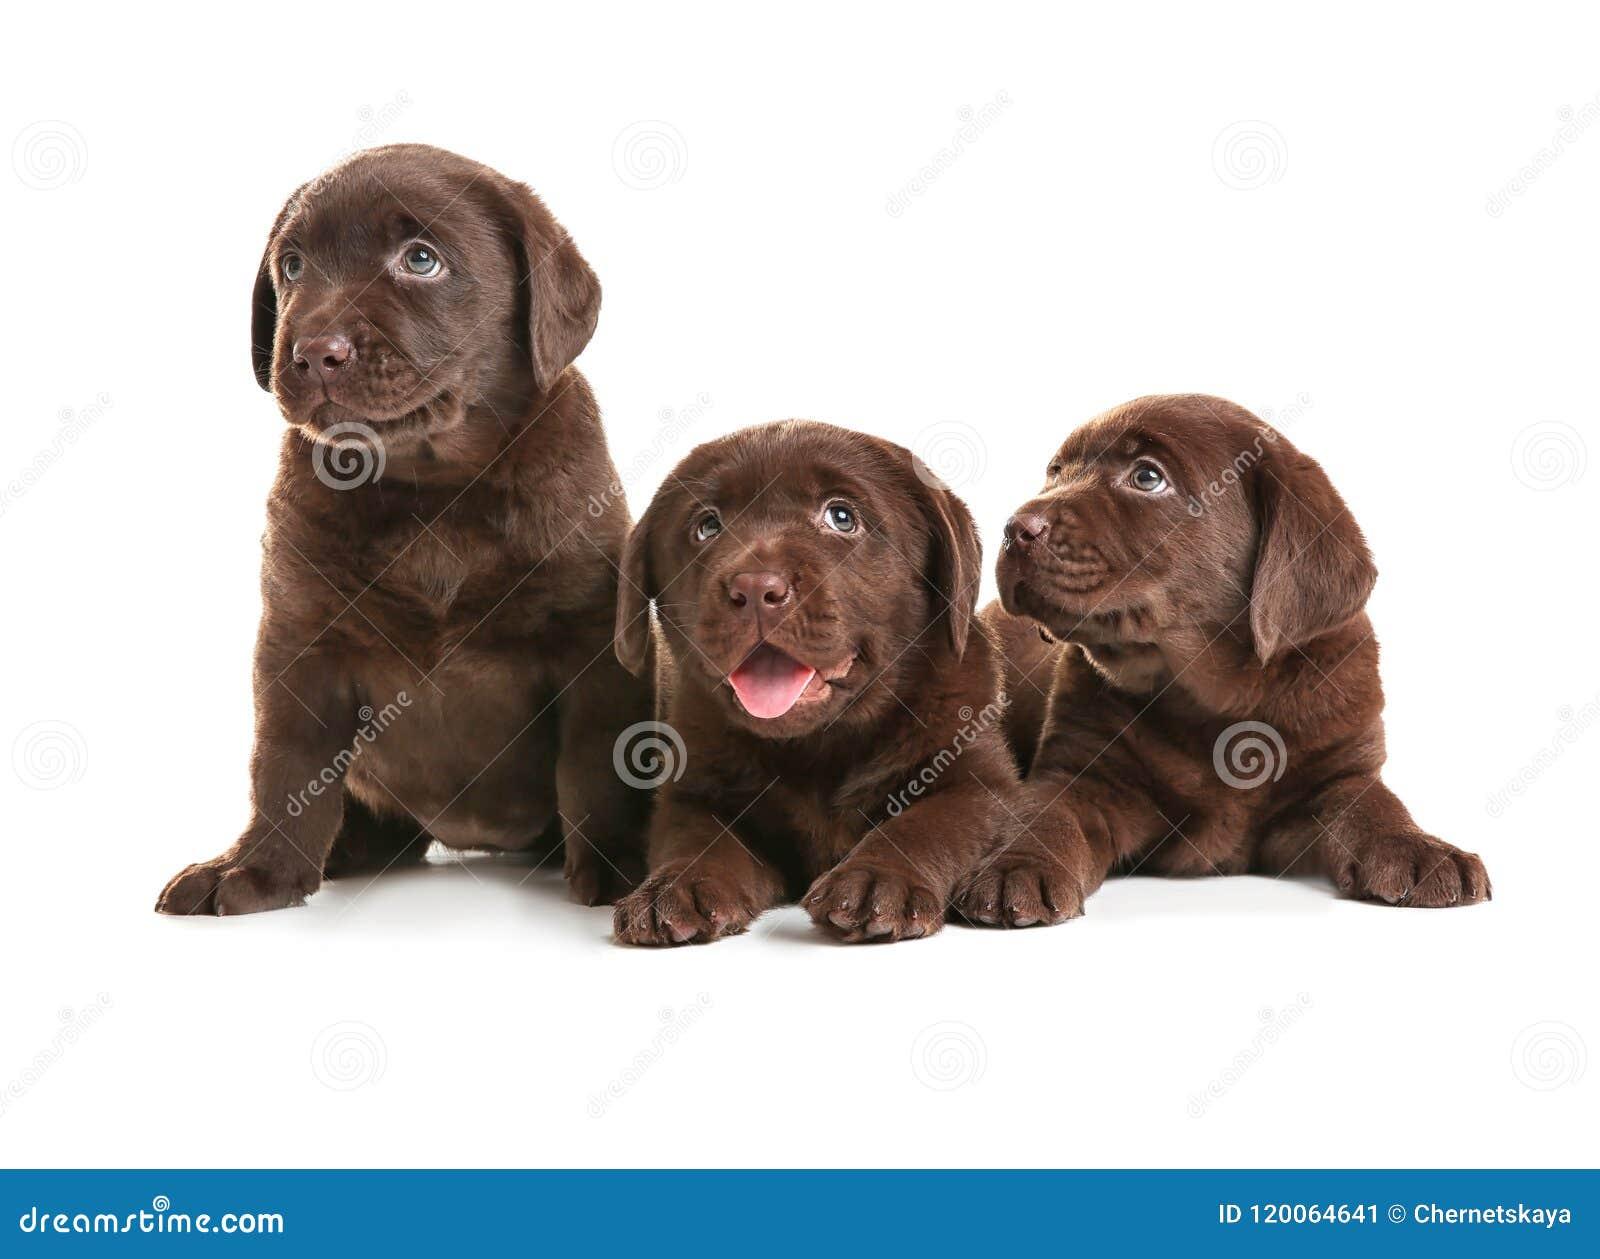 Chocolate Labrador Retriever Puppies On White Background